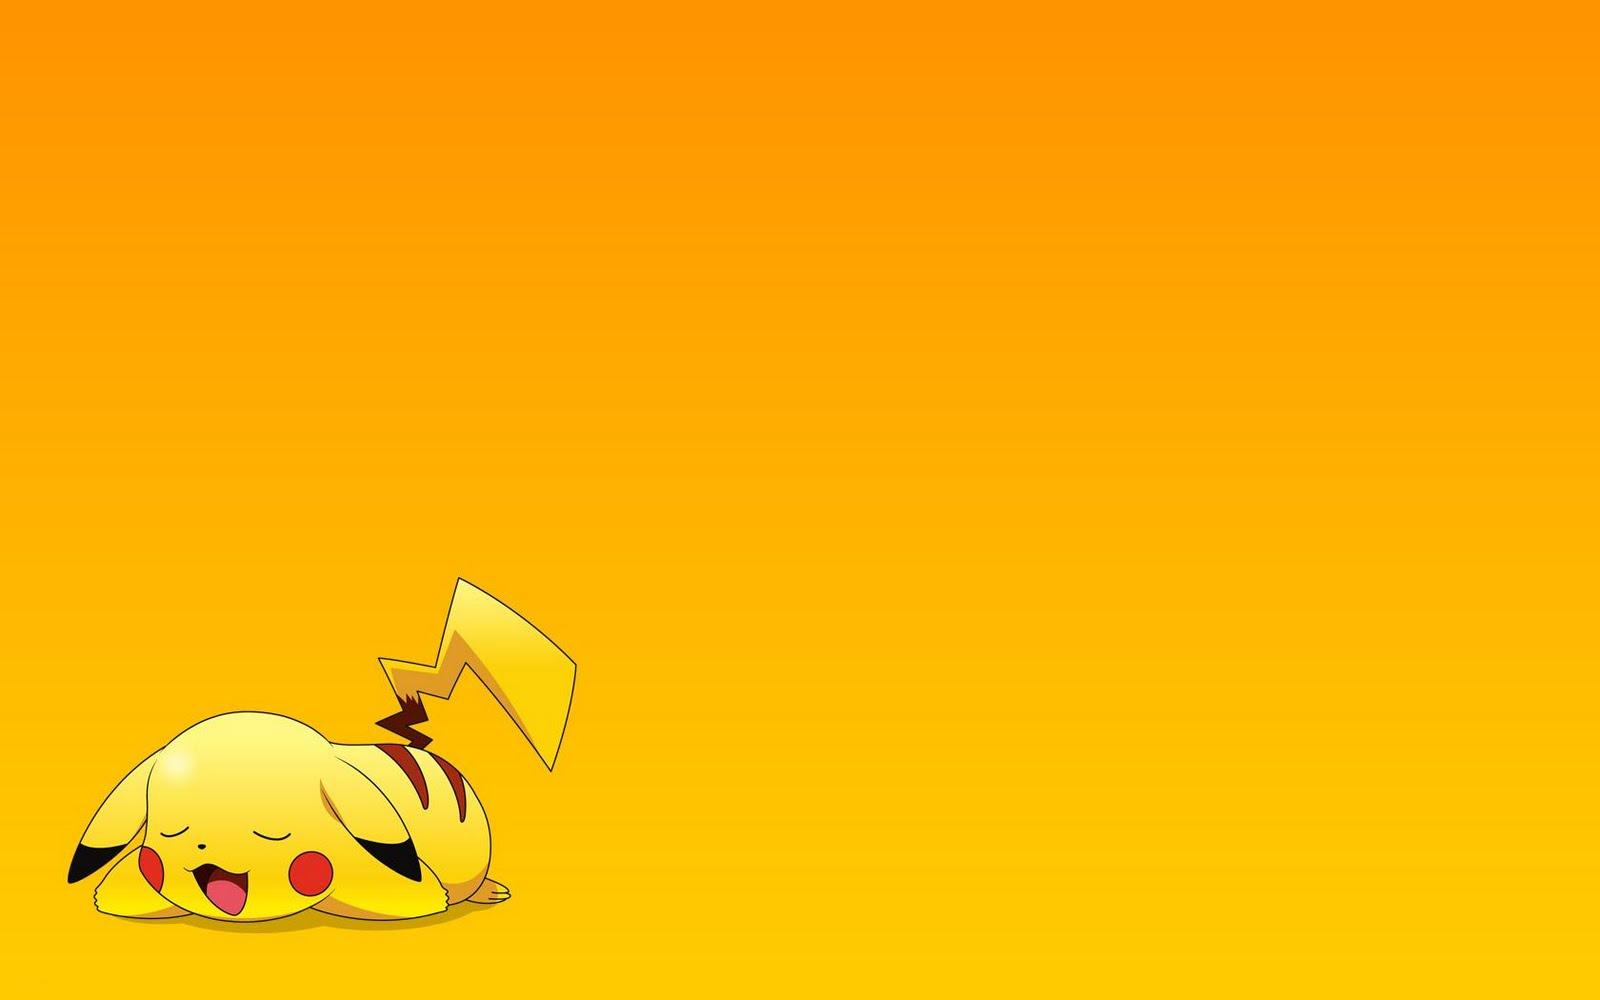 Pokemon HD Wallpaper Pikachu wwwvvallpapernetjpg 1600x1000